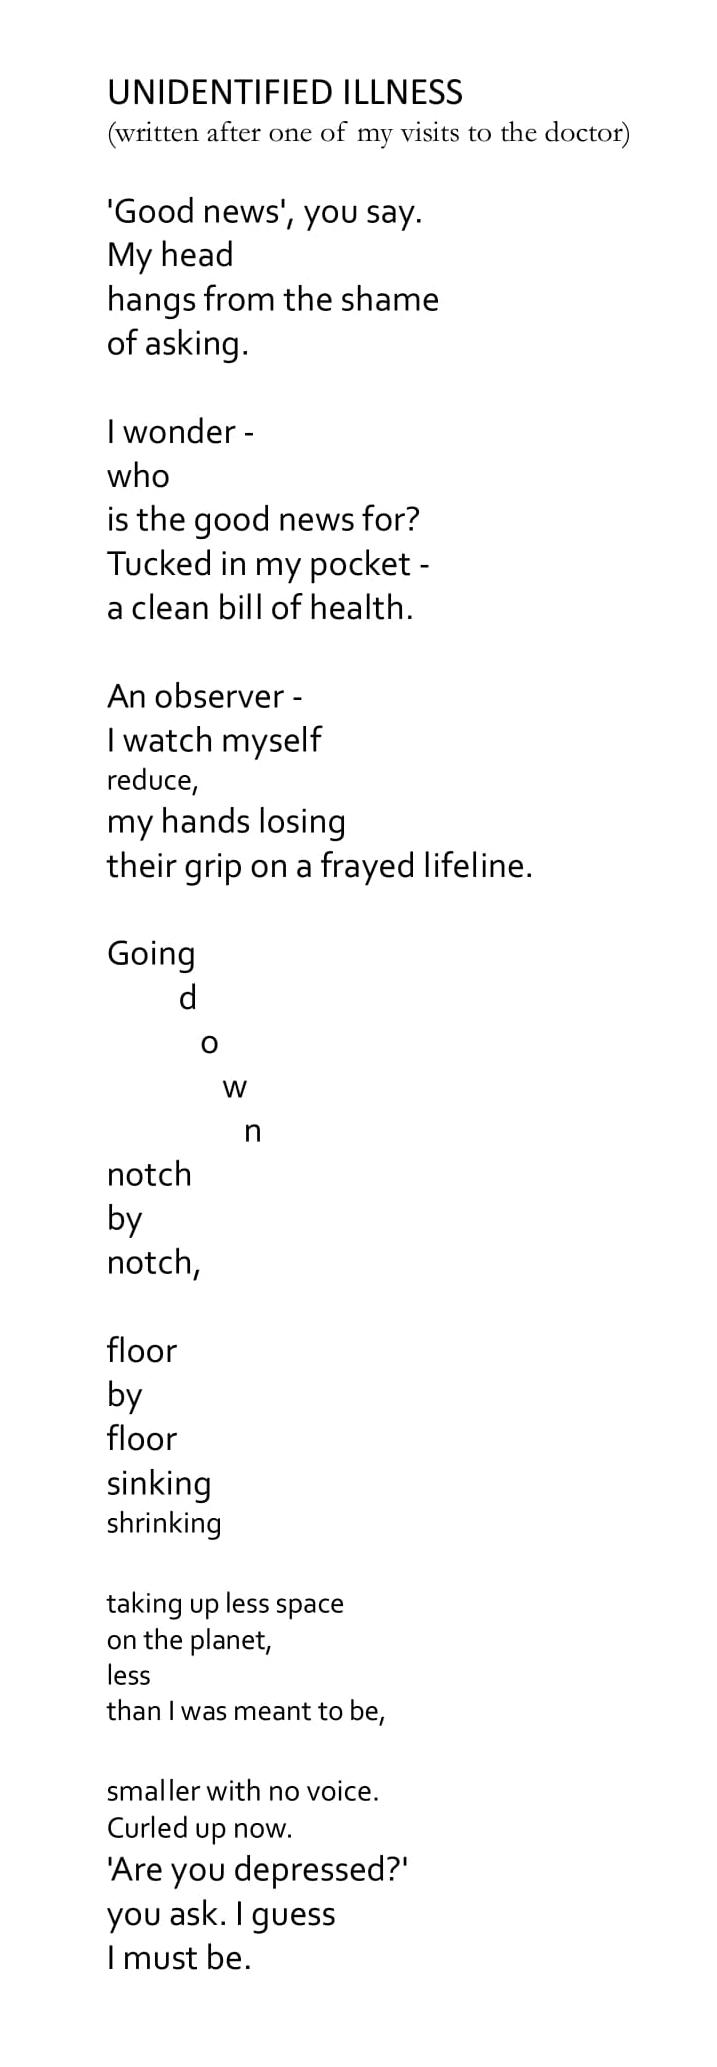 unidentified illness 3 Louisa Poem-1.jpg